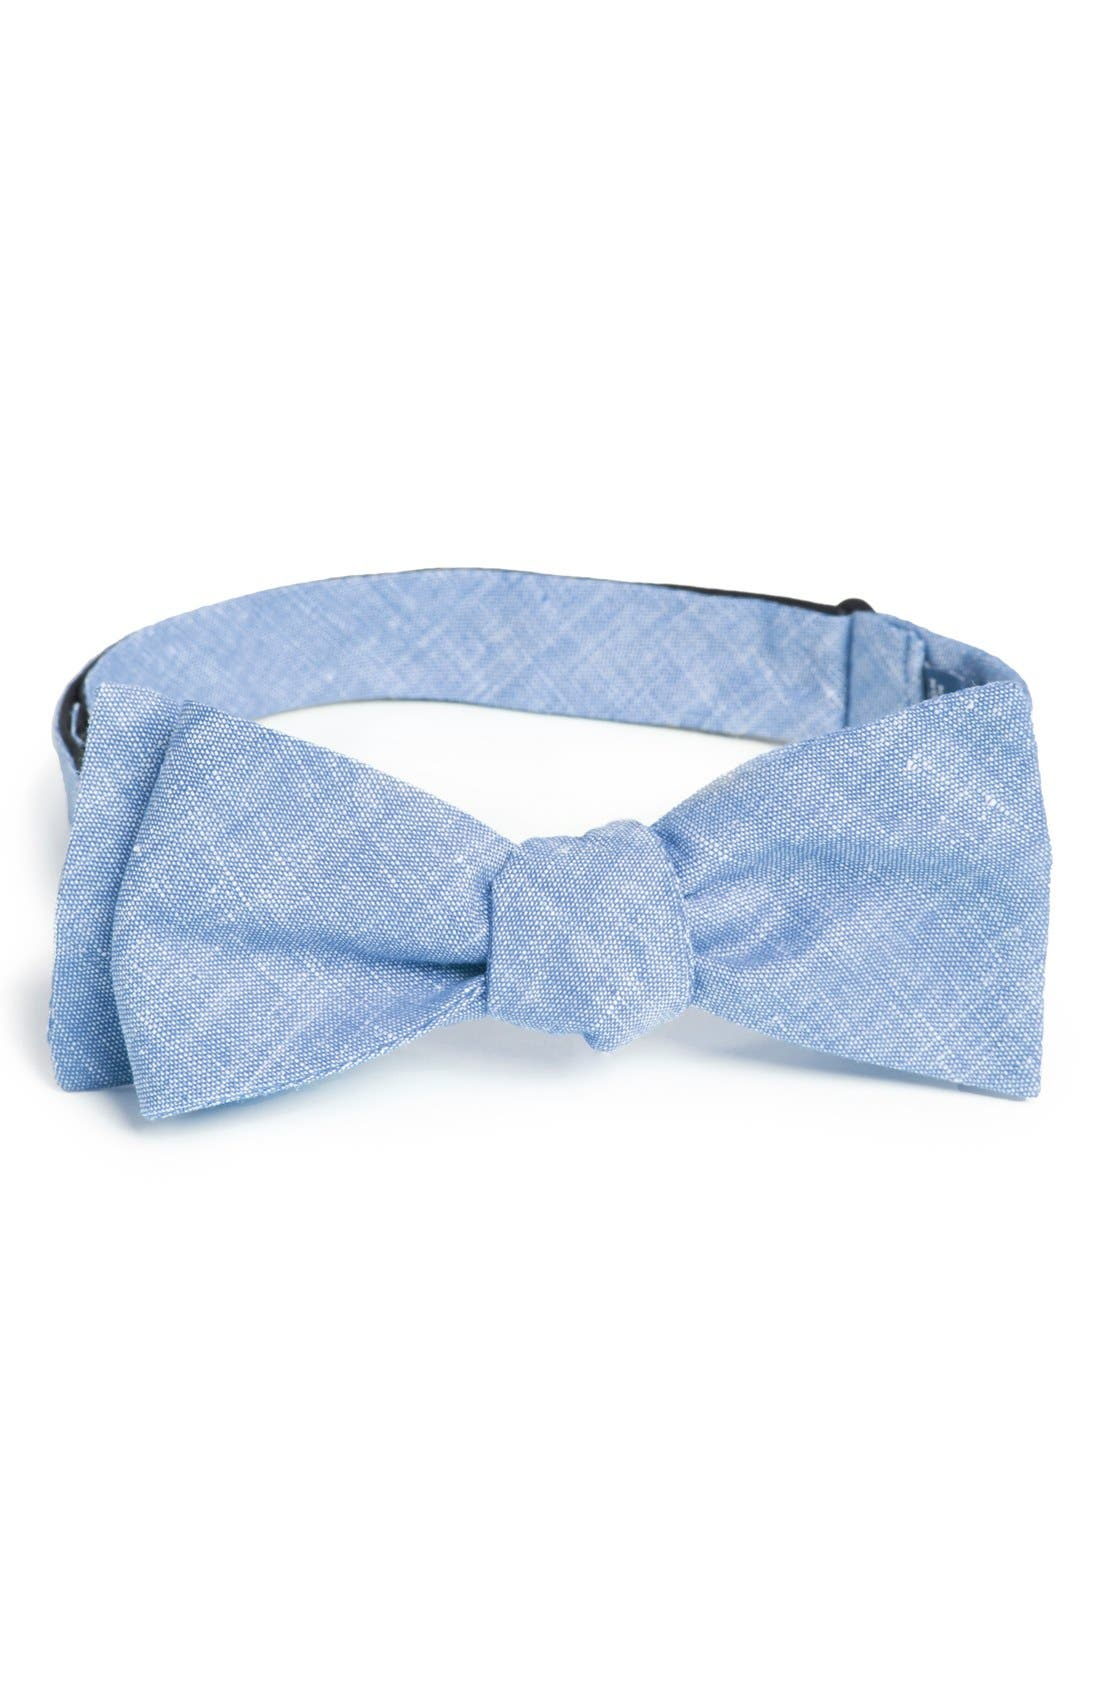 Alternate Image 1 Selected - Original Penguin Cotton Bow Tie